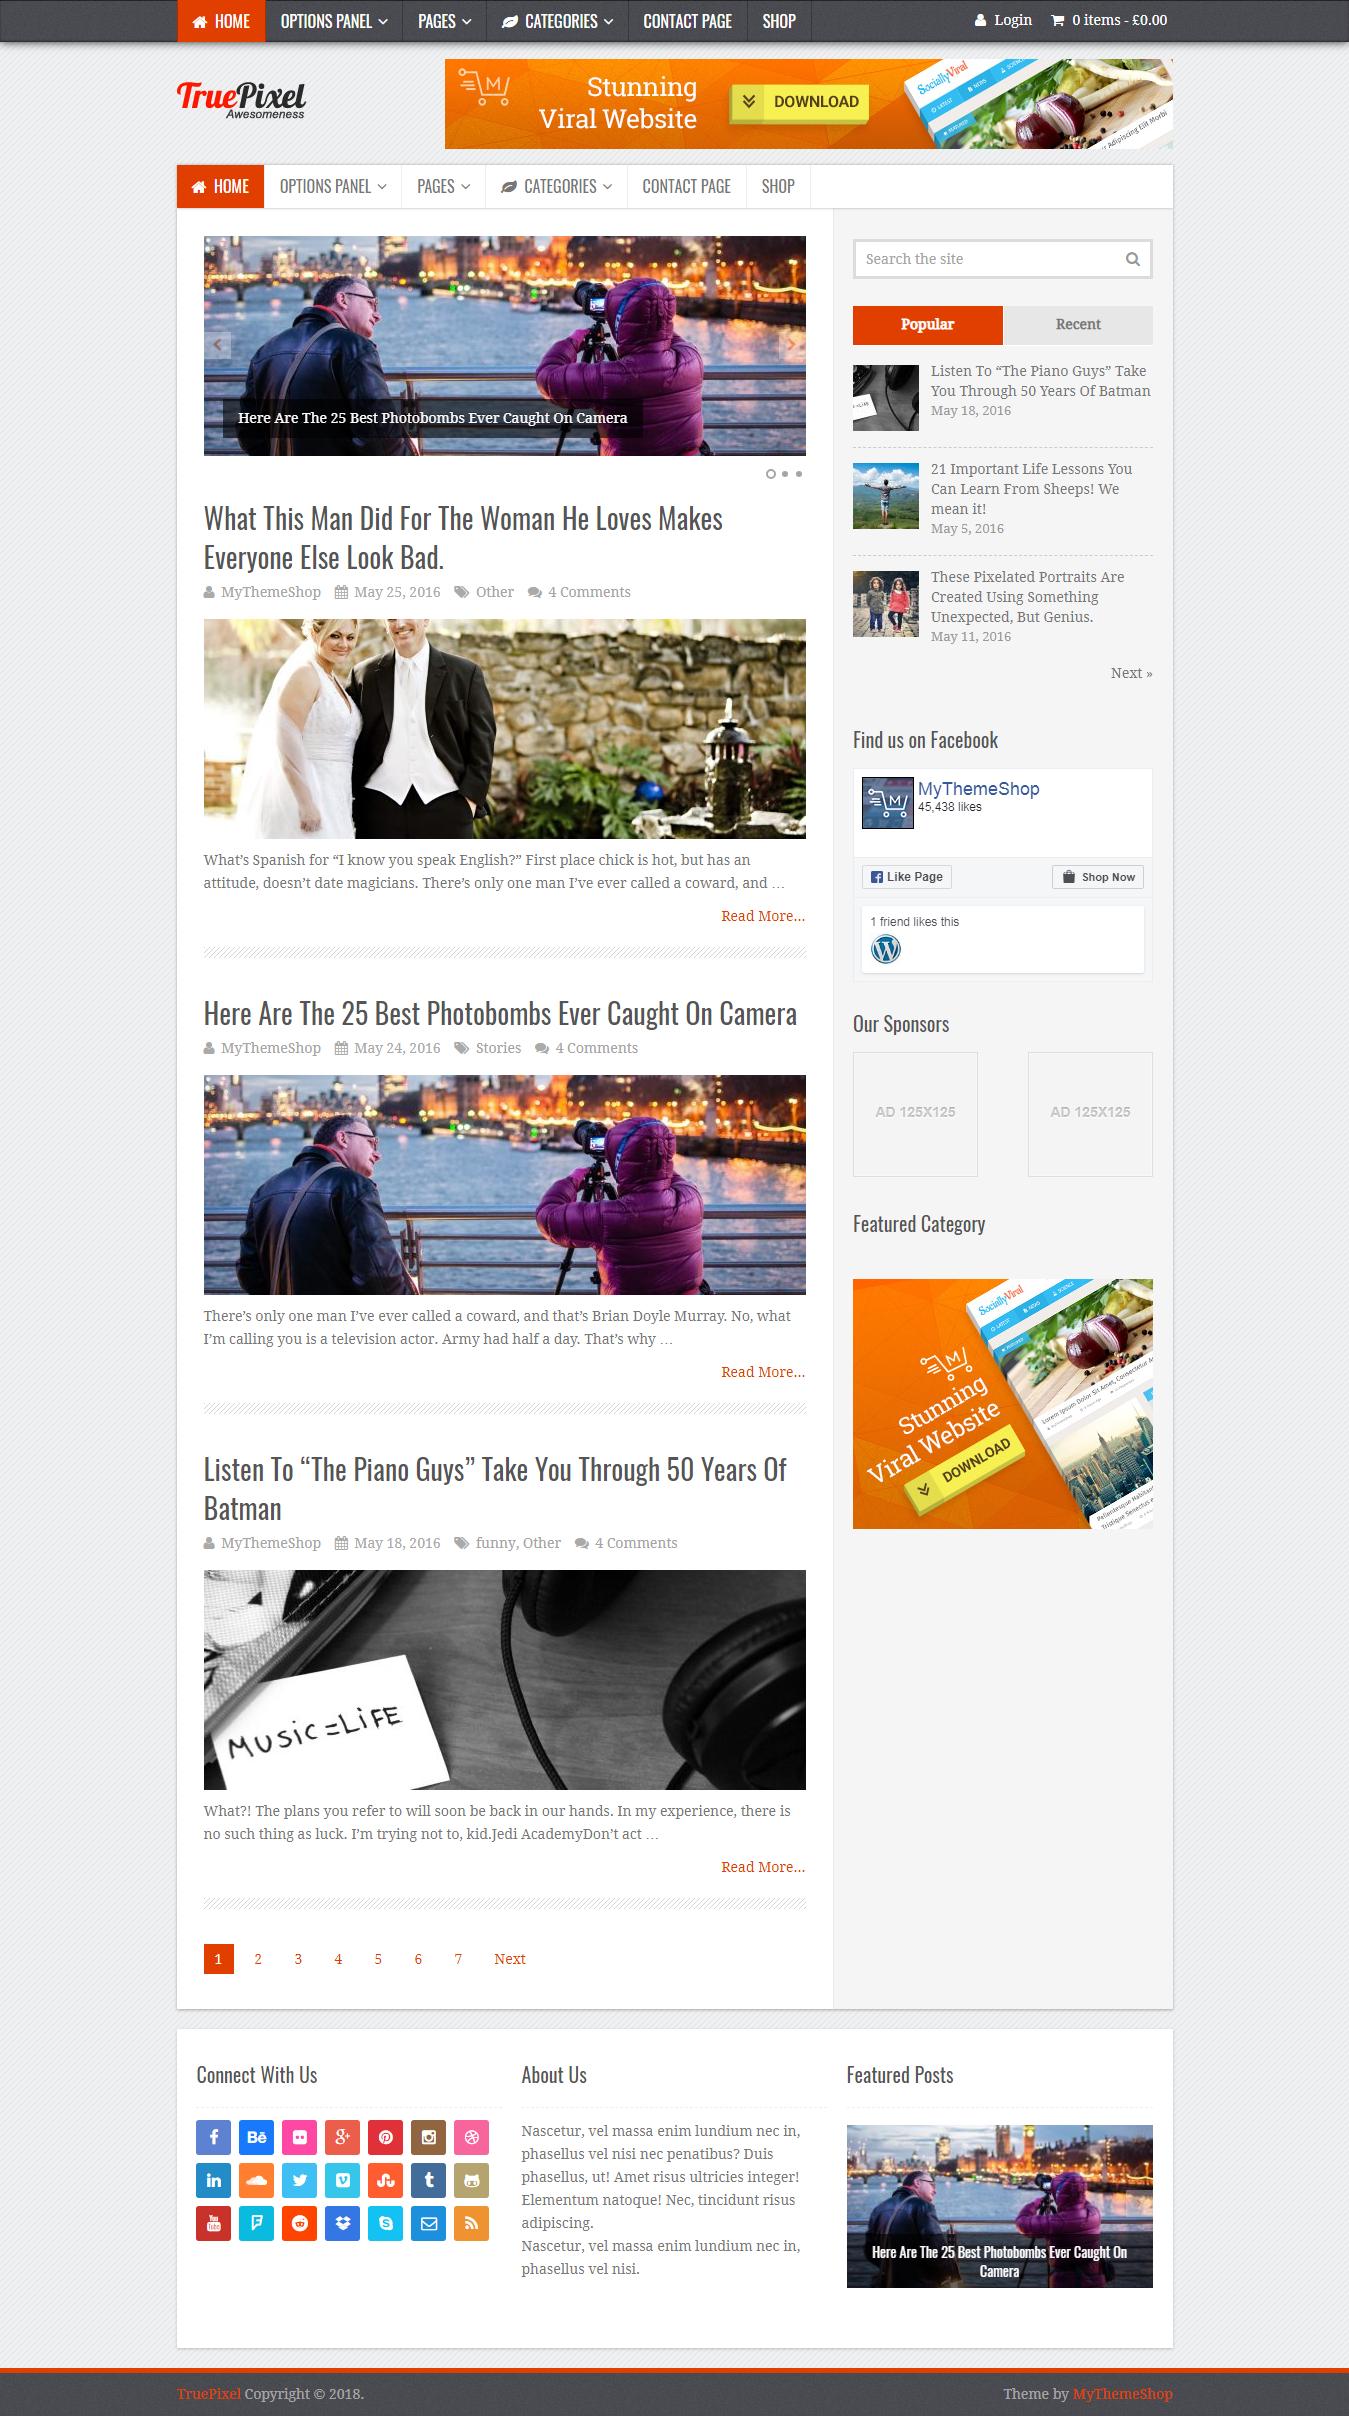 TruePixel - Best Premium Adsense Optimized WordPress Theme